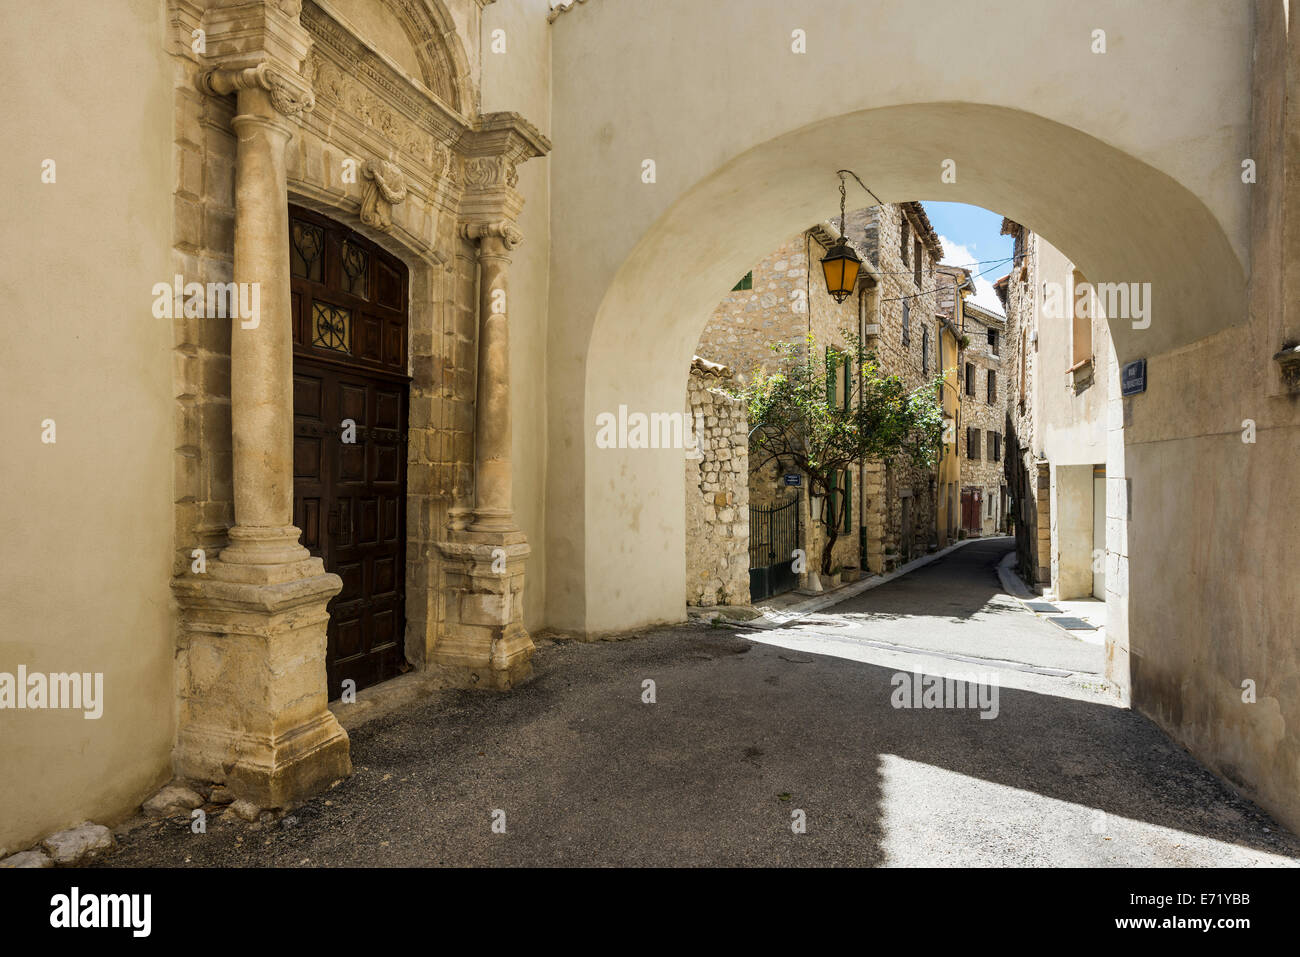 Kirche-Portal und Gasse, Buis Les Baronnies, Drôme, Rhône-Alpes, Provence, Frankreich Stockbild